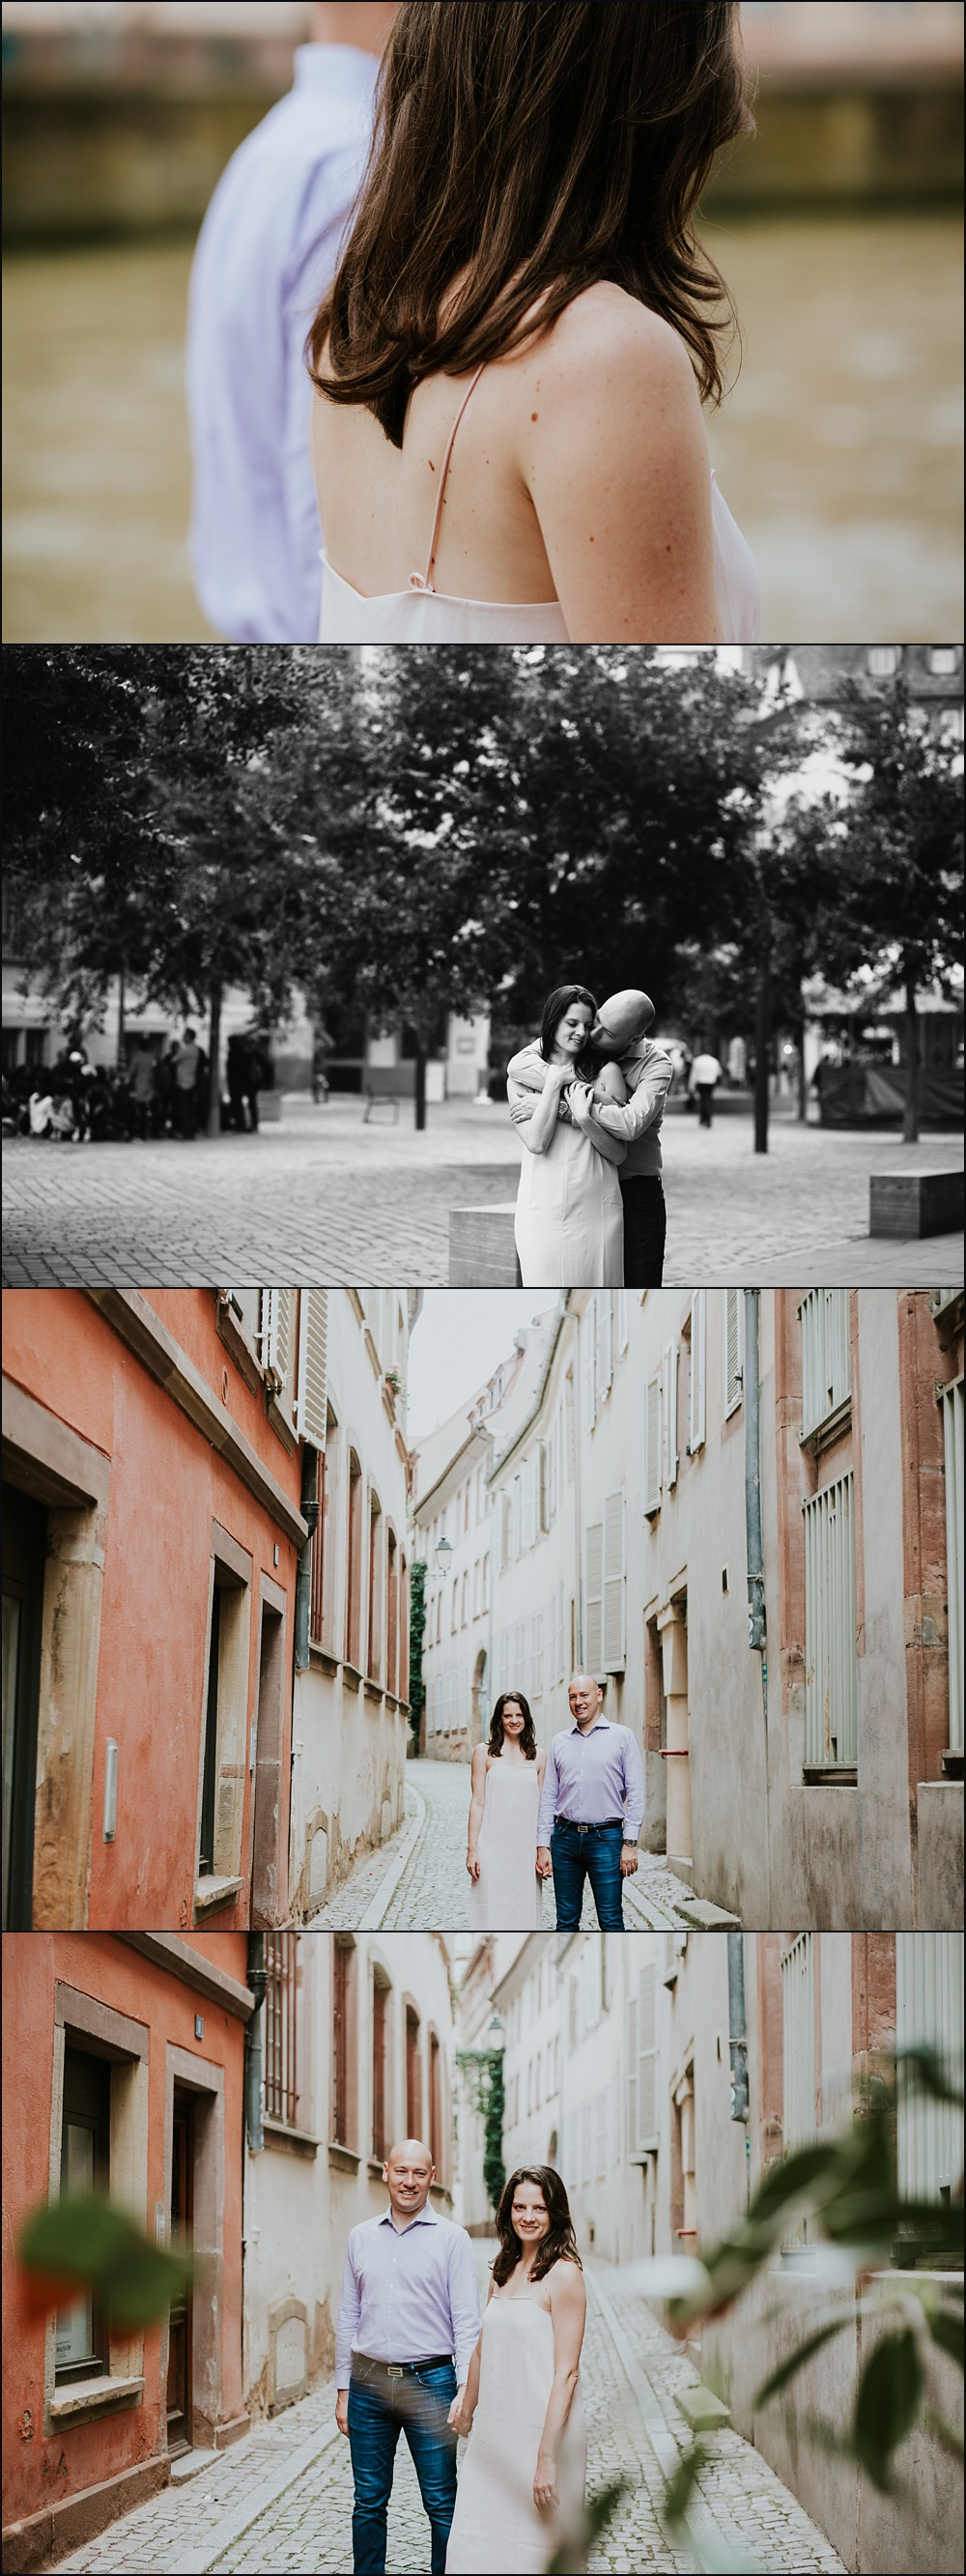 Séance photo couple Strasbourg